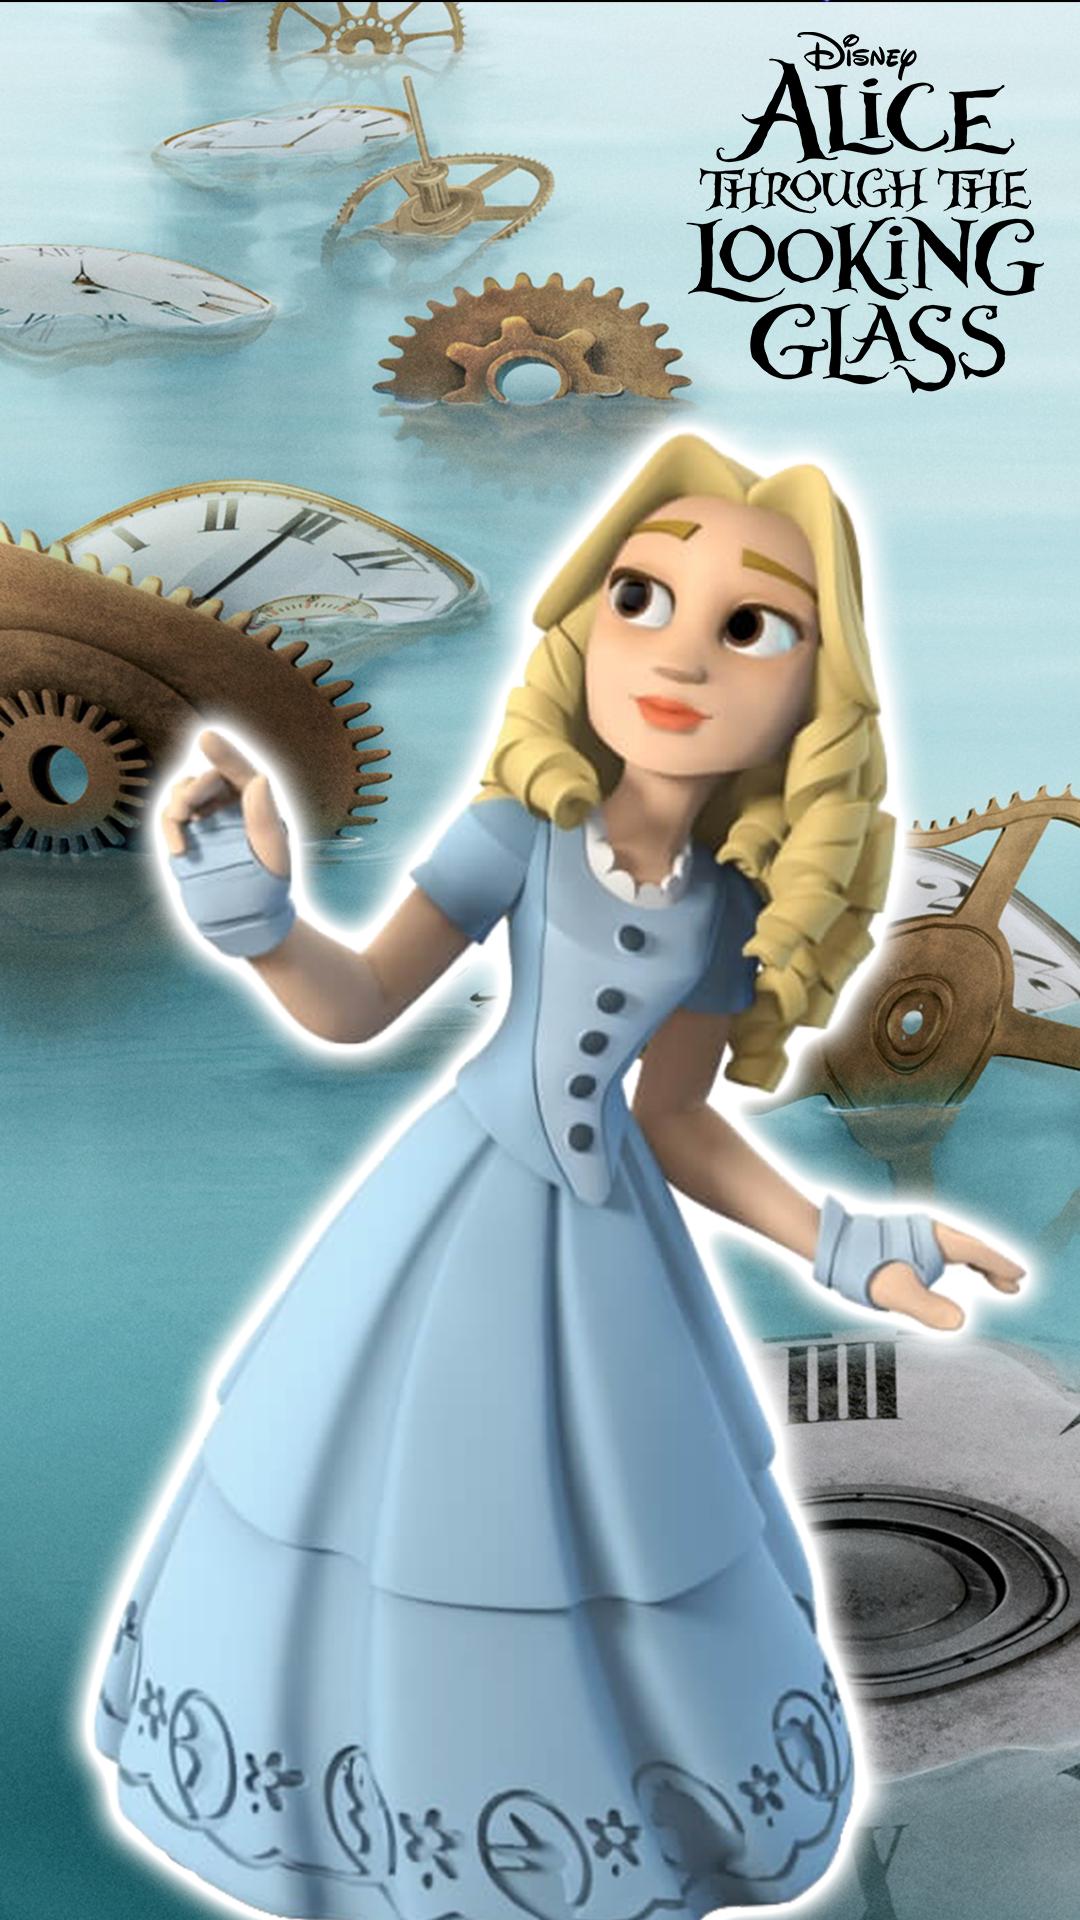 Alice Wallpaper   Disney Infinity Codes   Cheats amp Help Blog 1080x1920